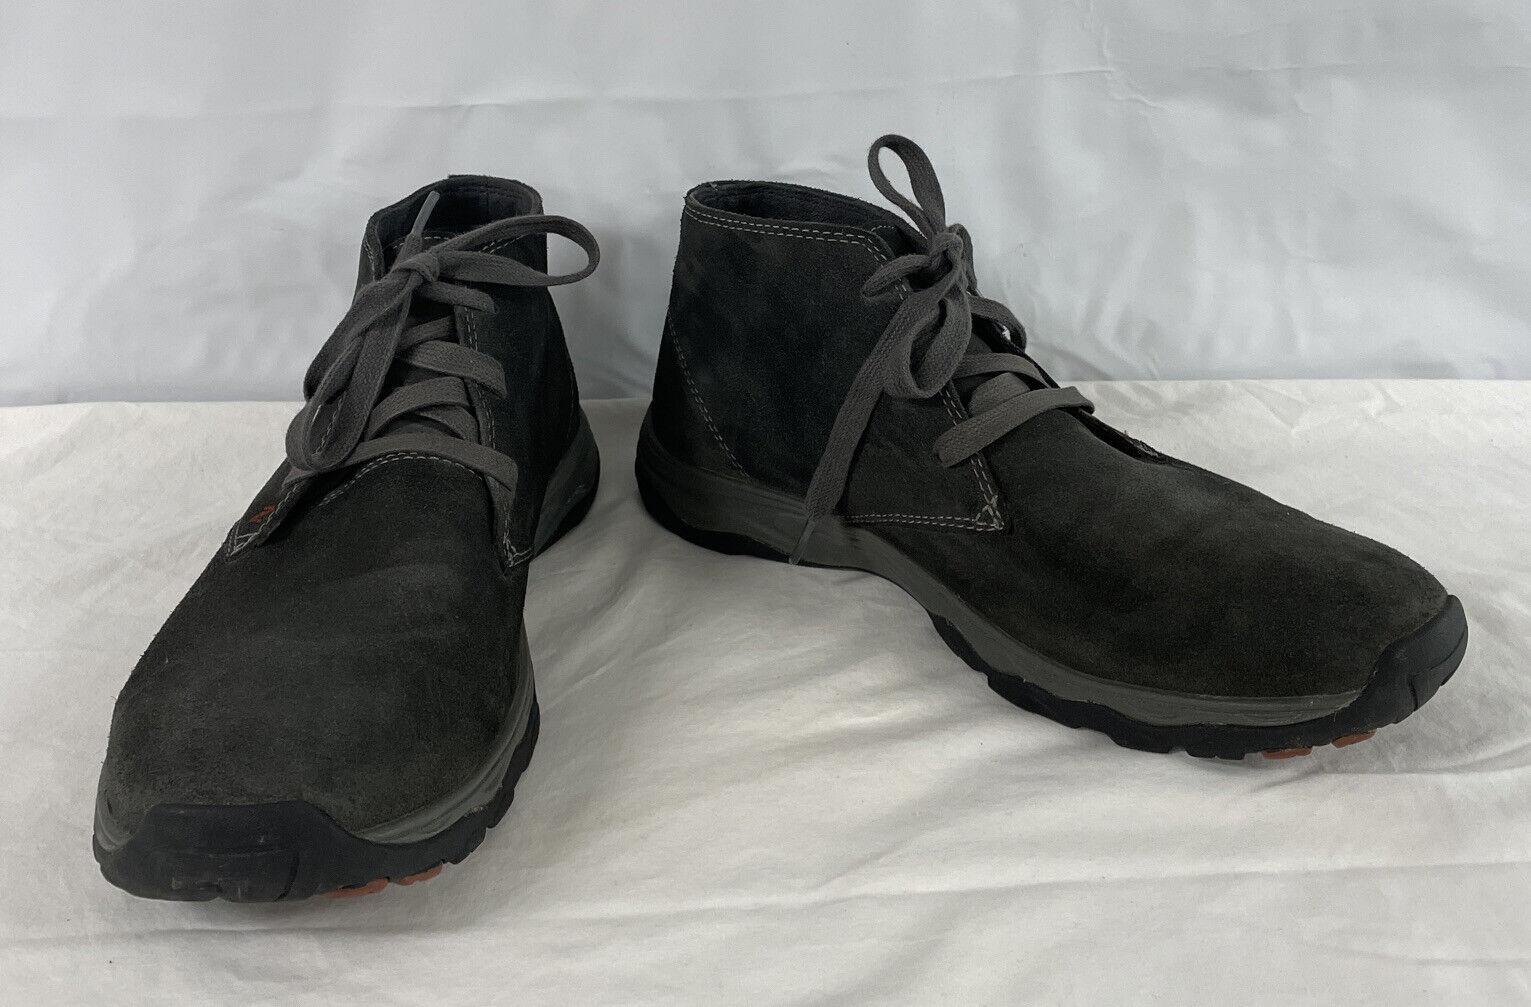 Eddie Bauer Mens Boots Ankle Departure 3387-766 Gray Suede Chukka Sz (12)